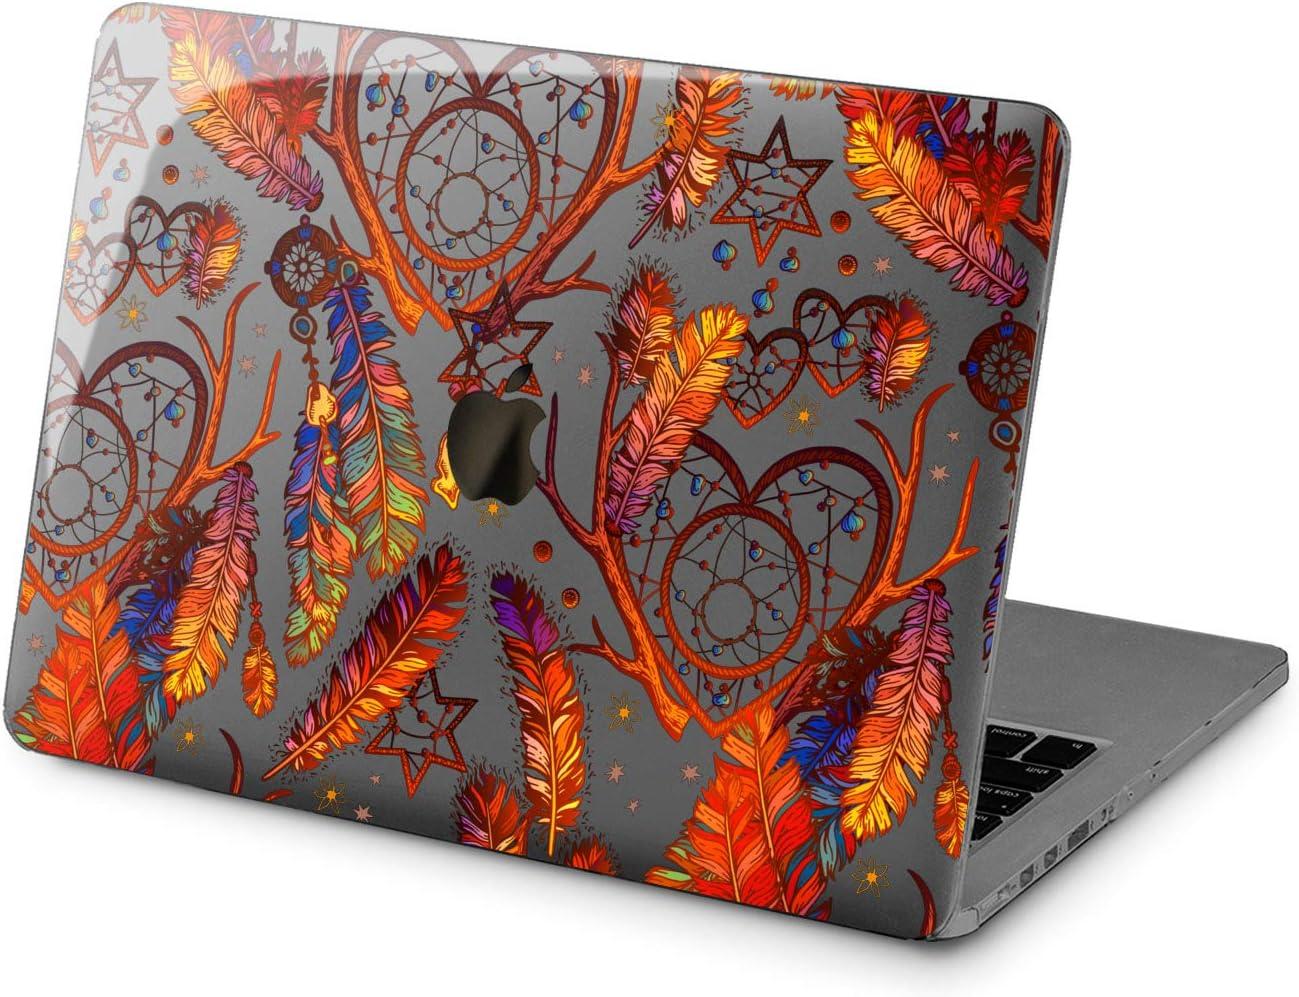 Cavka Hard Shell Case for Apple MacBook Pro 13 2019 15 2018 Air 13 2020 Retina 2015 Mac 11 Mac 12 Look Foil Design Mandala Silver Protective Print Plastic Simple Laptop Bohemian Texture Cover